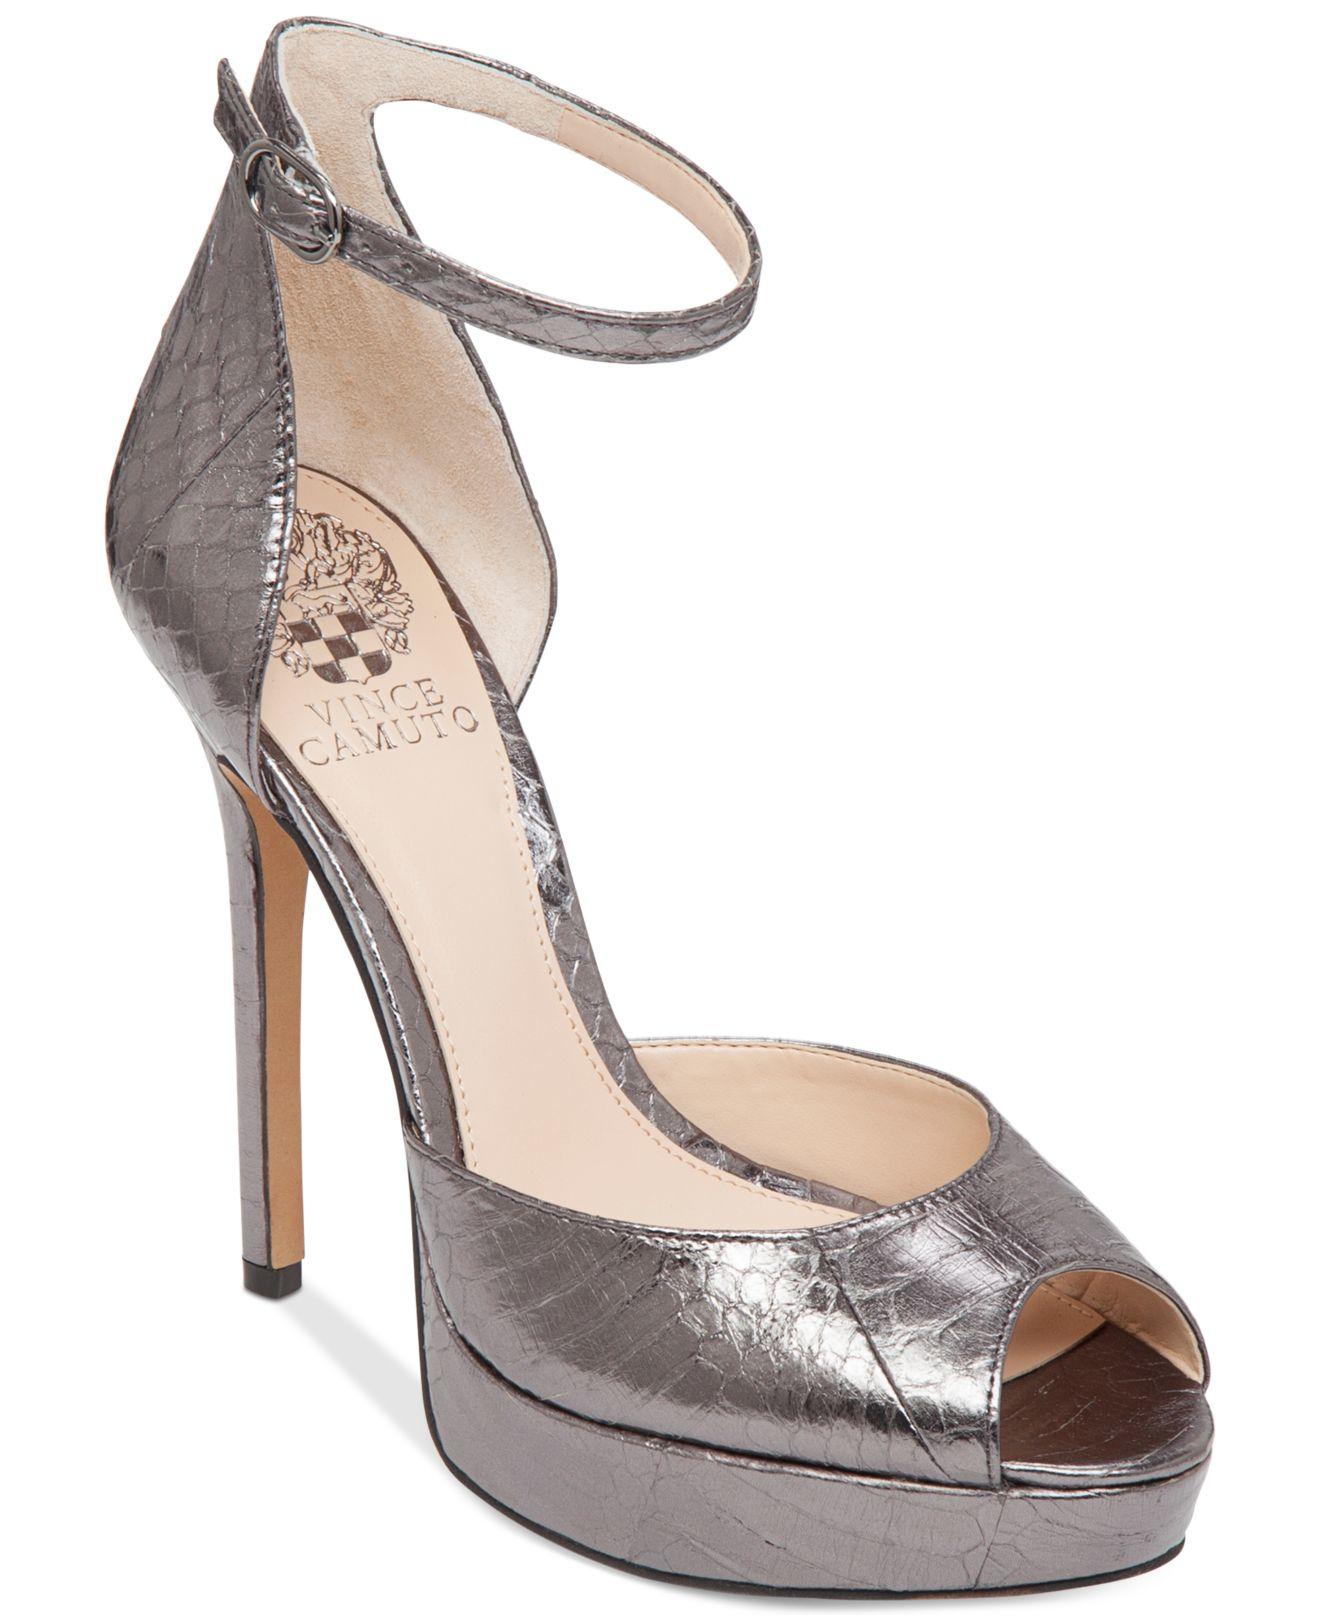 Vince Camuto Lillith Ankle Strap Platform Sandals In